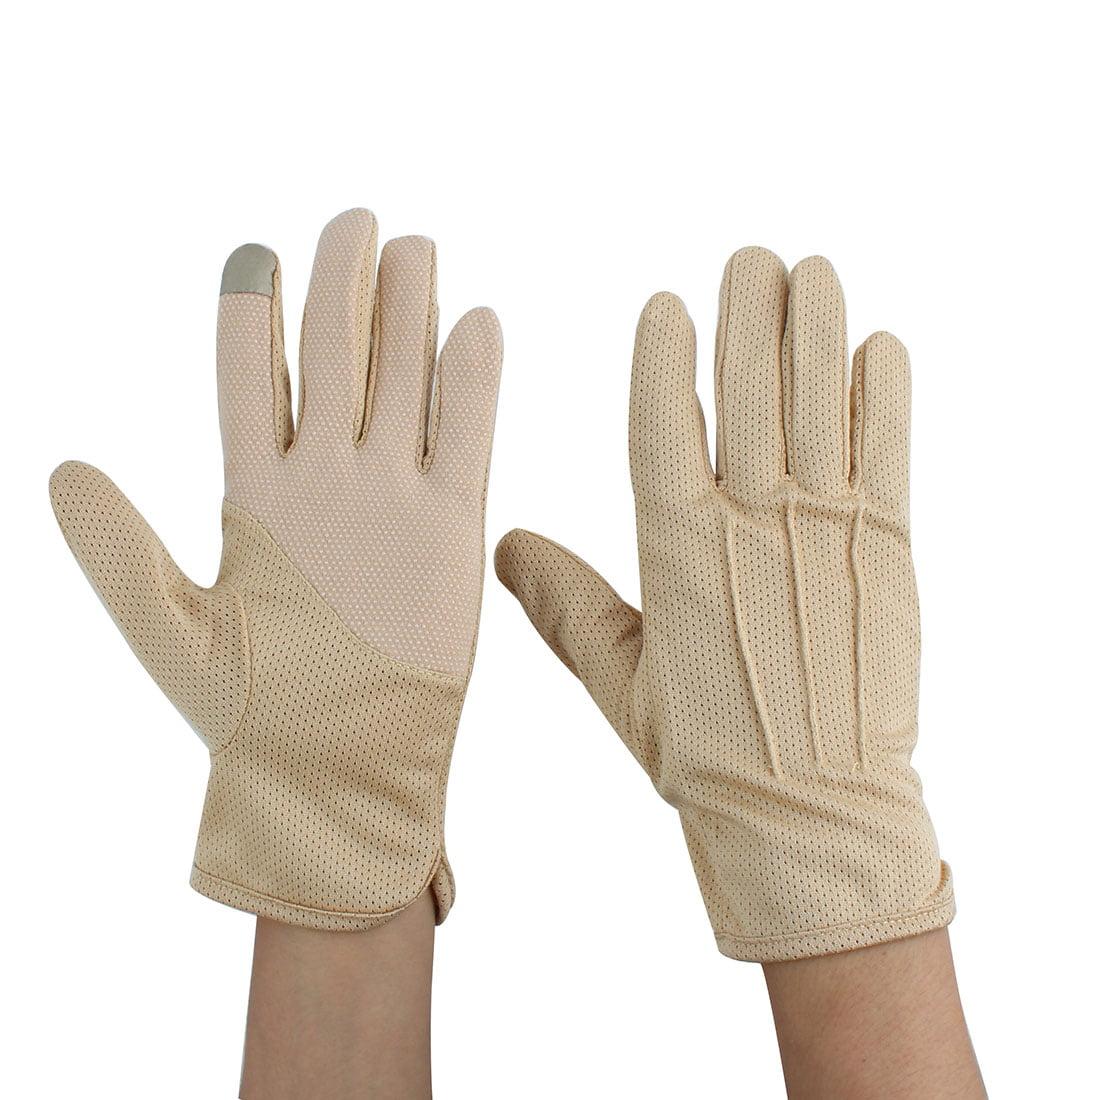 Man Summer Motorcycle Riding Driving Sun Resistant Gloves Protector Khaki #2